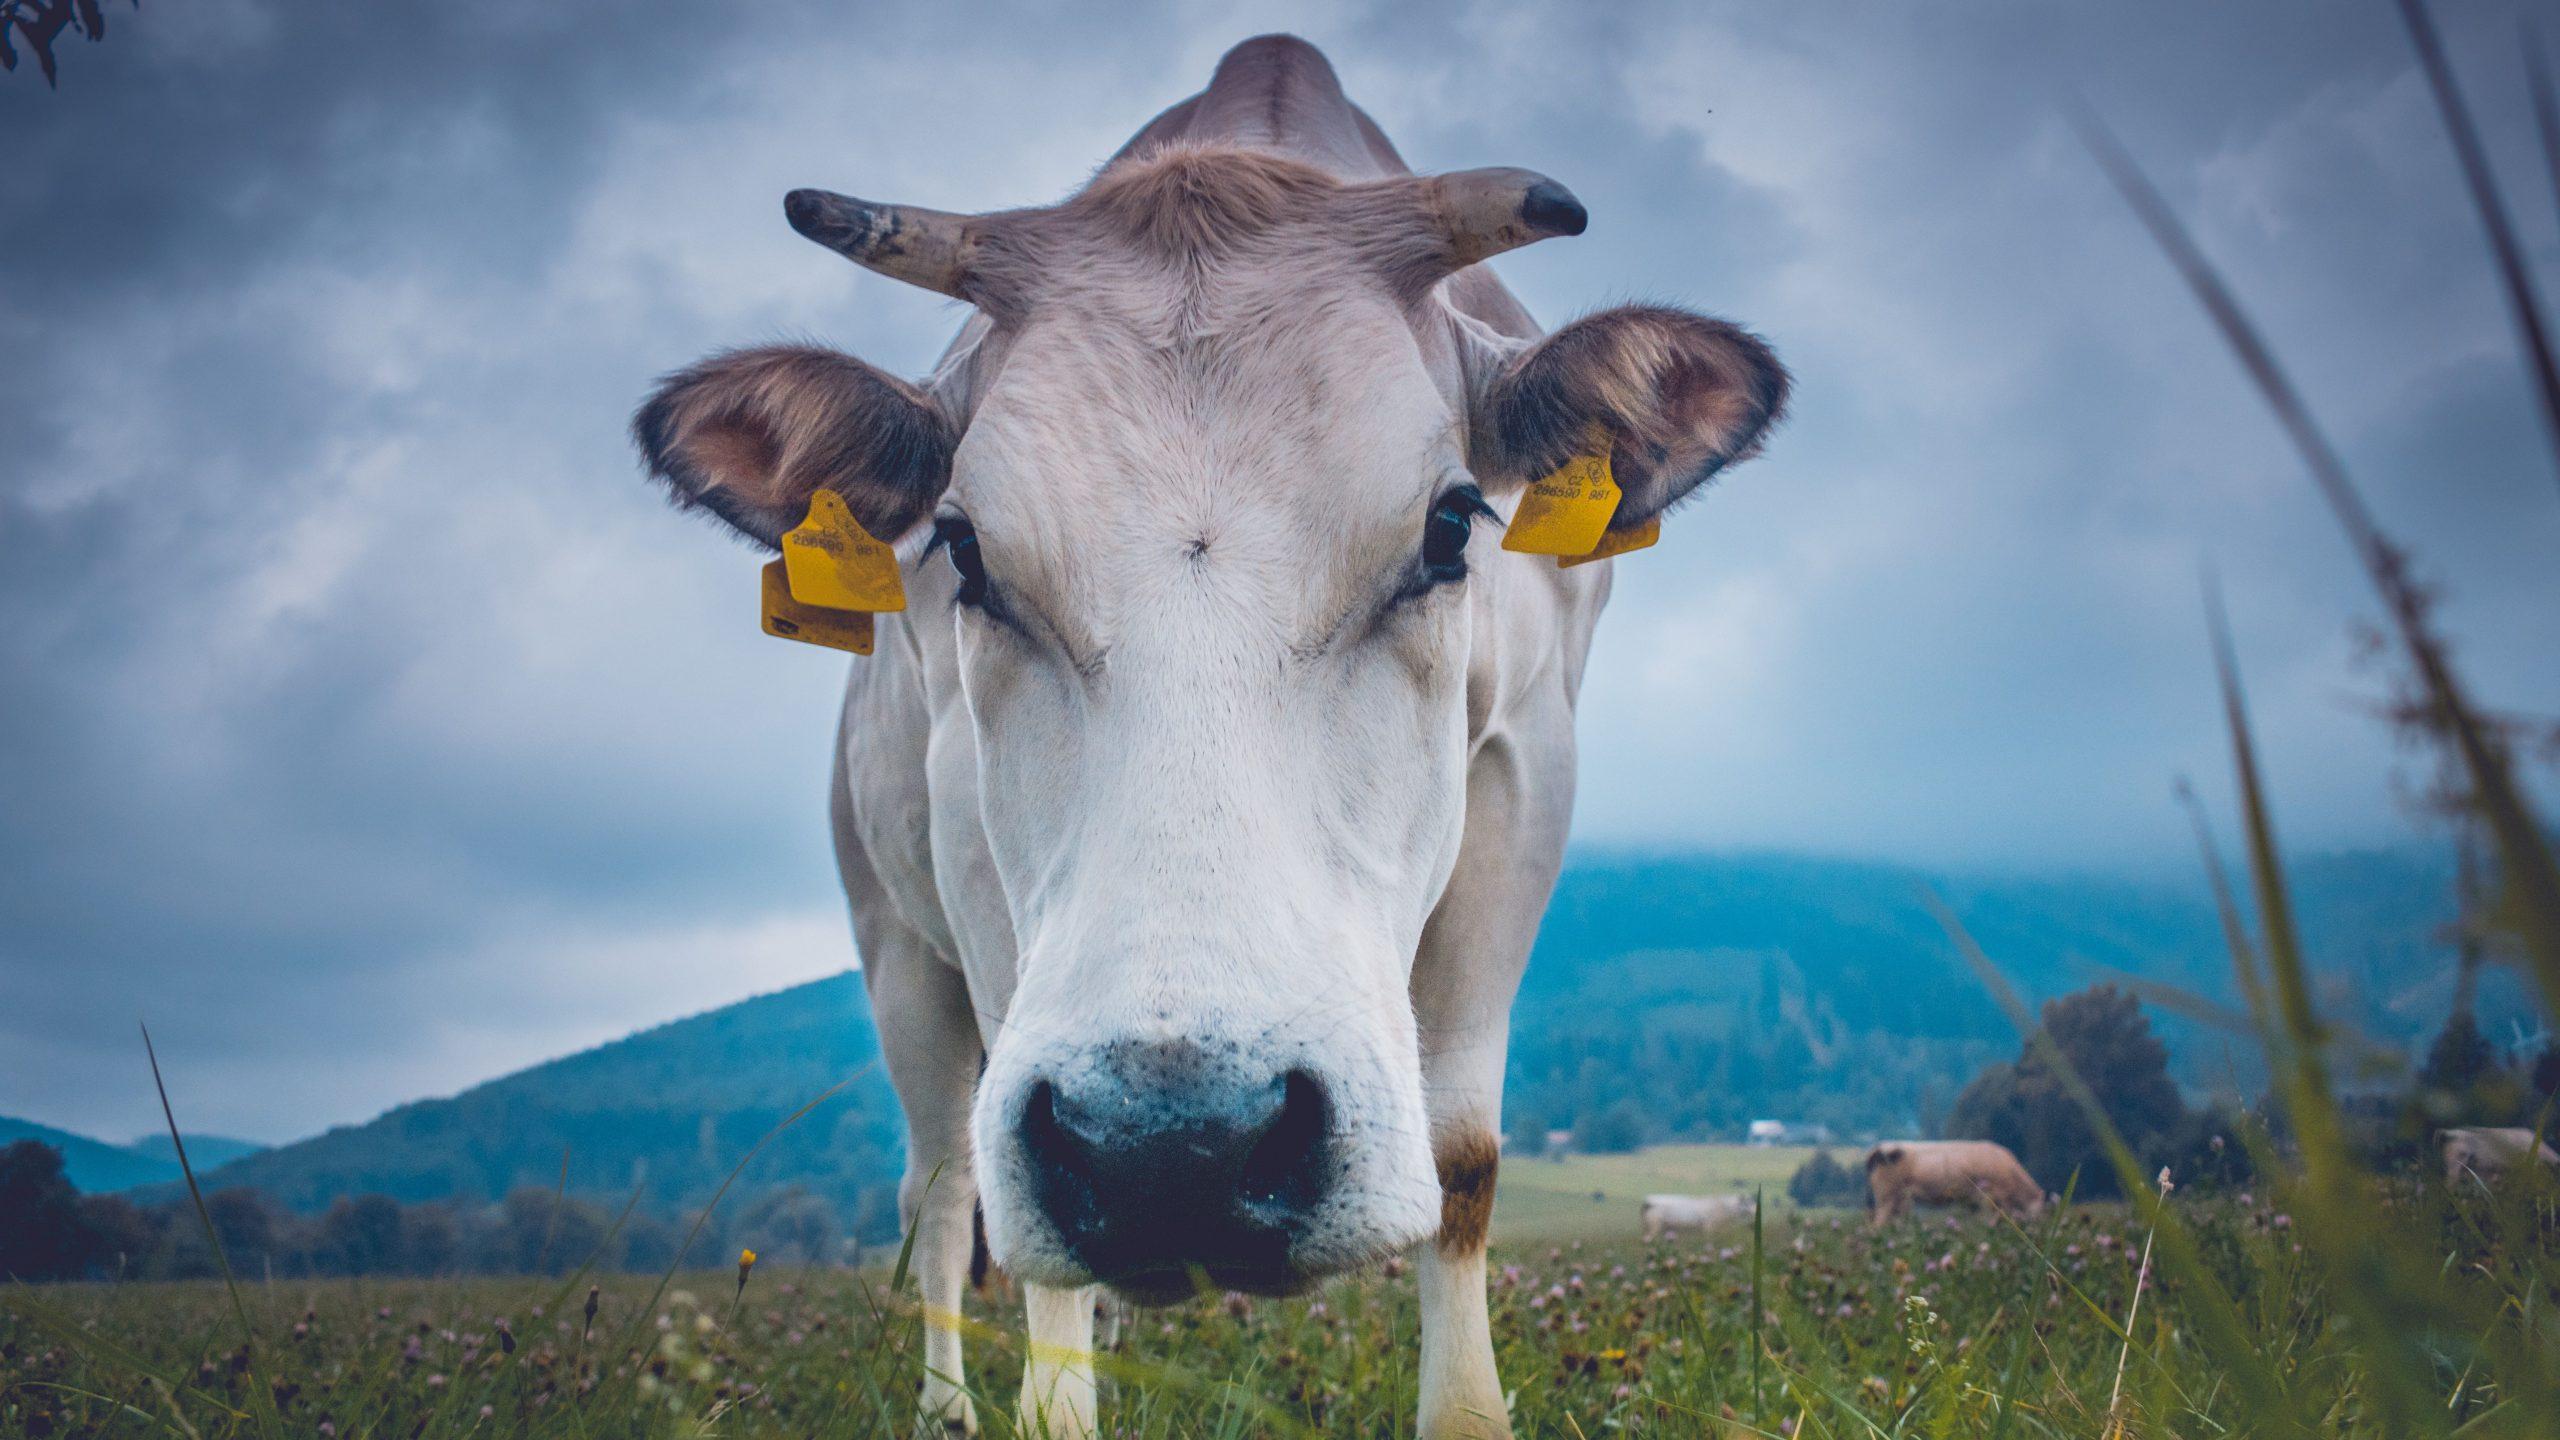 Robots Won't Fix Animal Agriculture's Welfare Problem